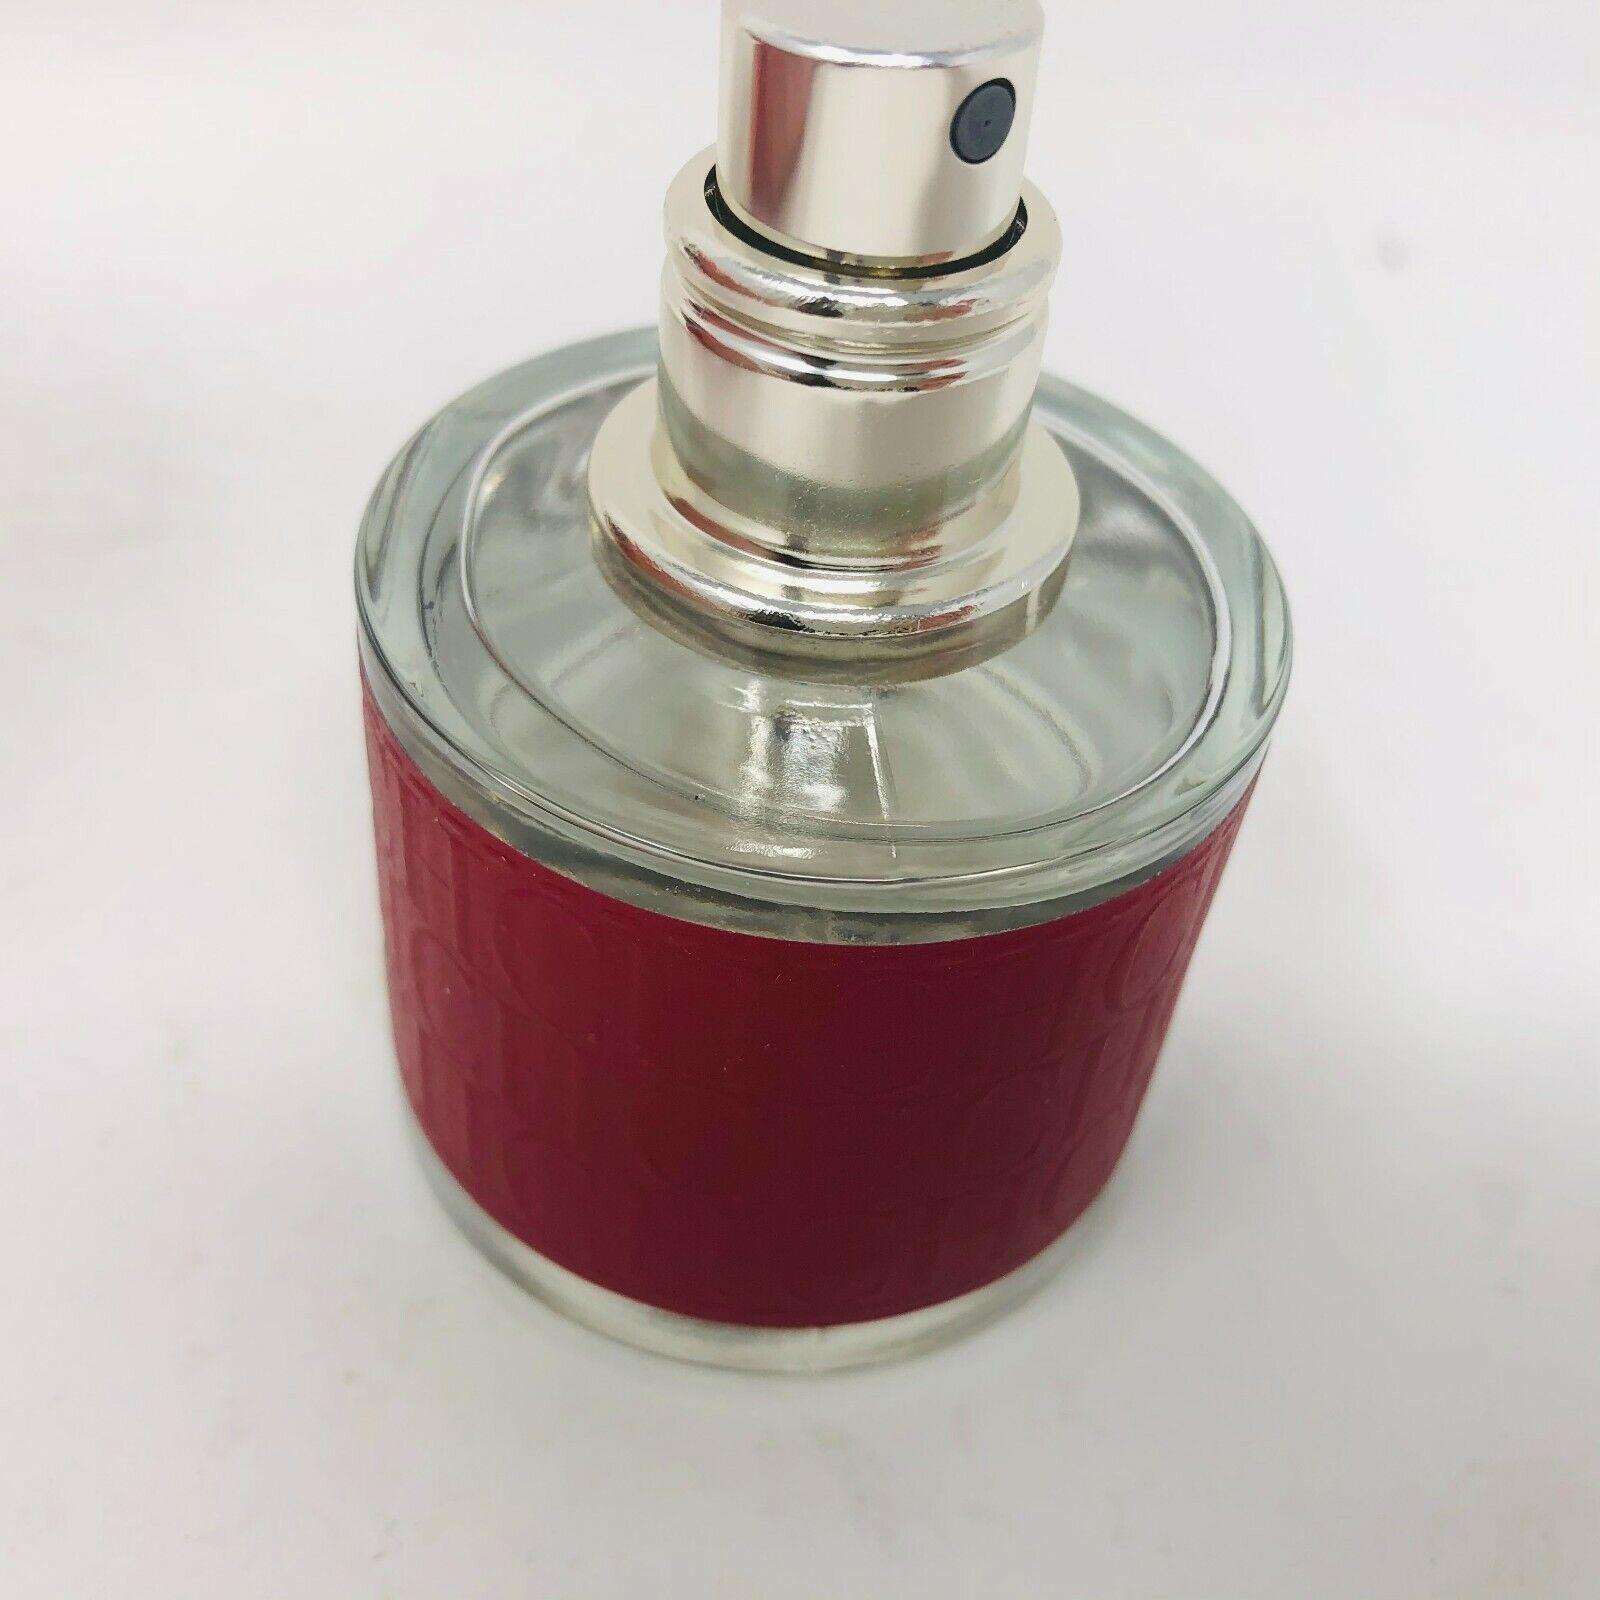 CH Carolina Herrera Eau De Toilette Perfume Fragrance Spray 1 FL OZ Full New